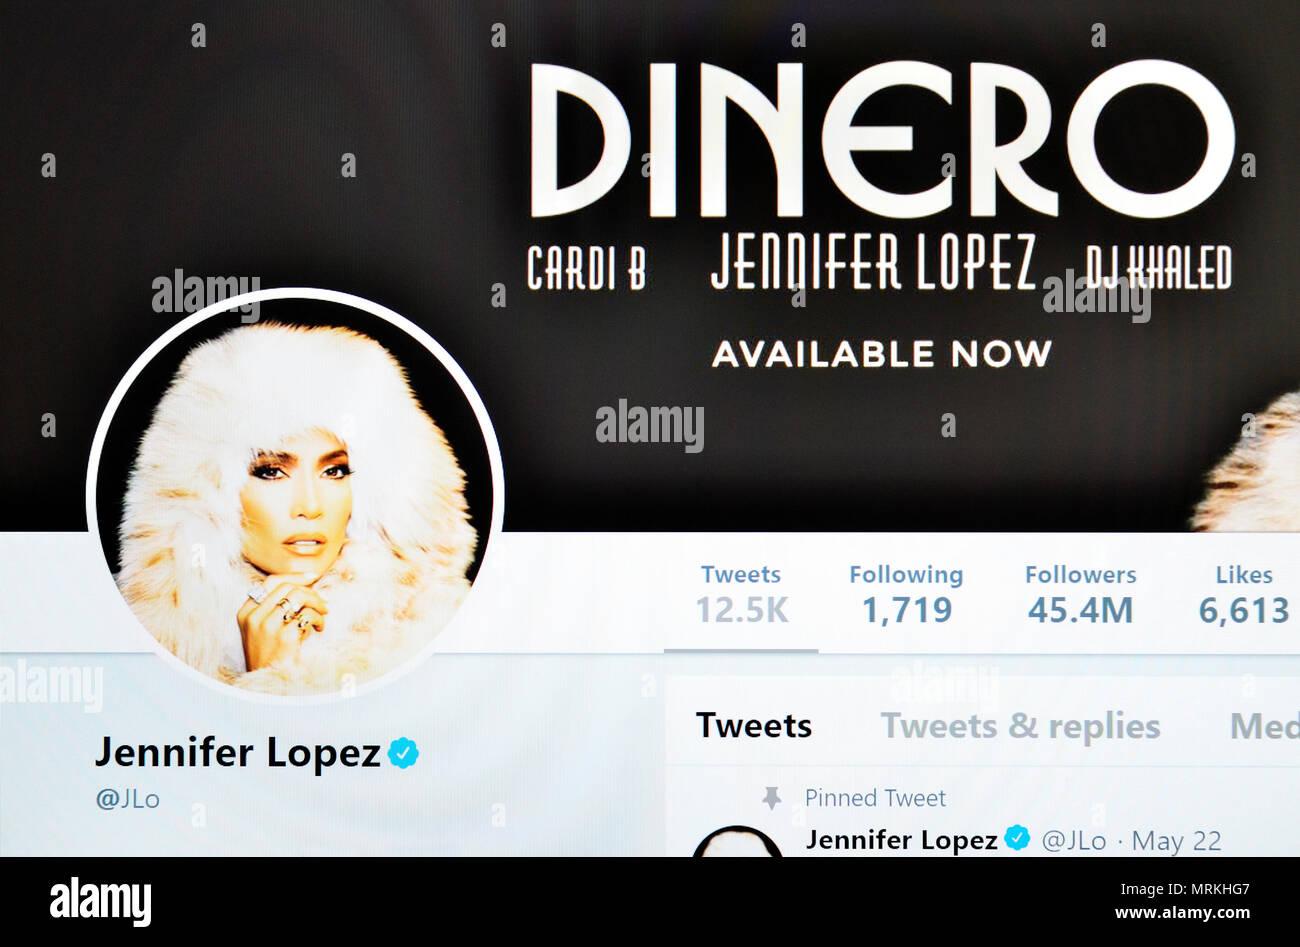 Jennifer Lopez Twitter page (2018) - Stock Image